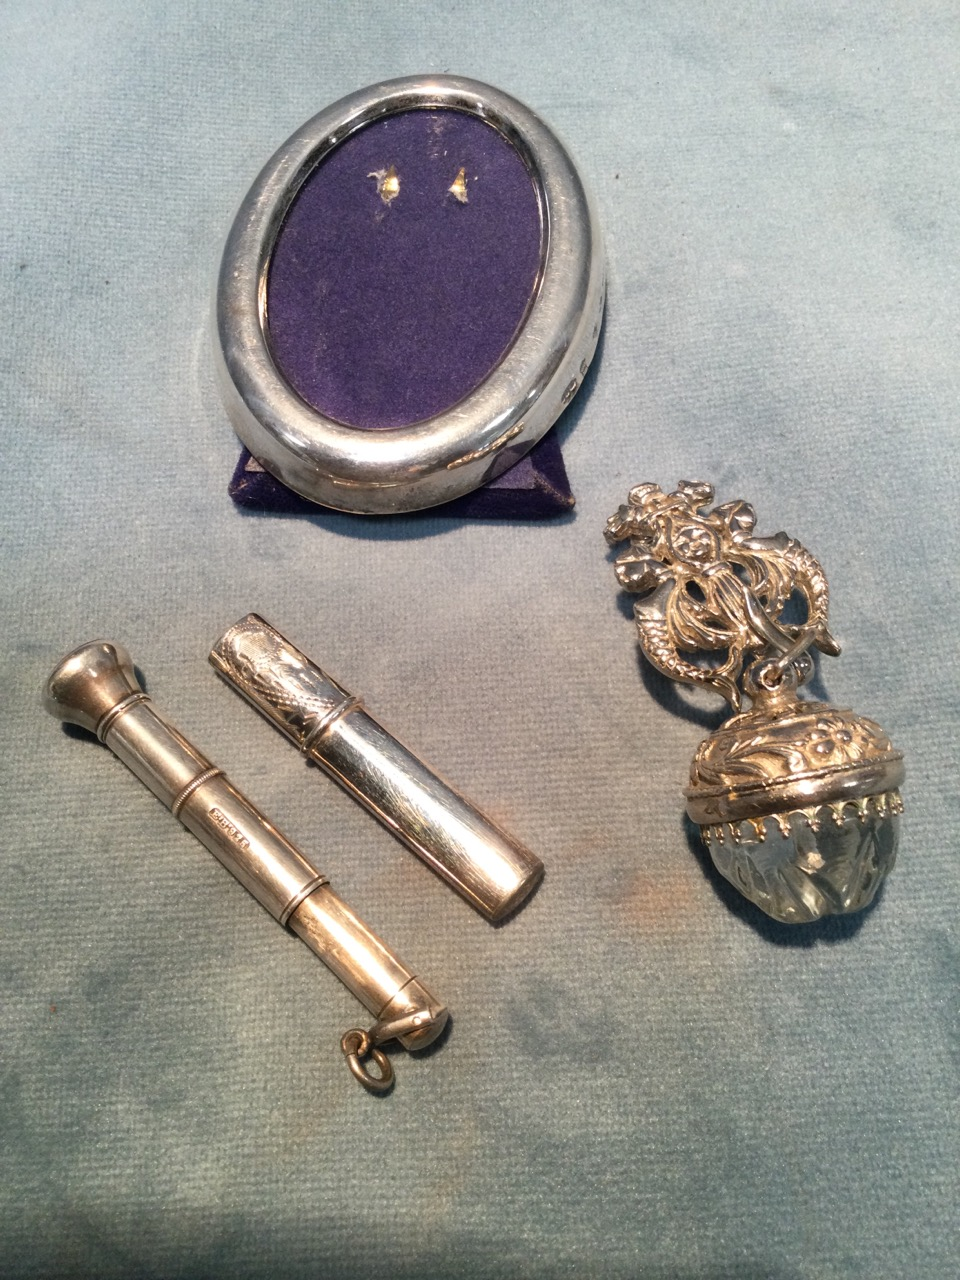 A small oval hallmarked silver photo frame; a telescopic silver cherute holder; a glass ball